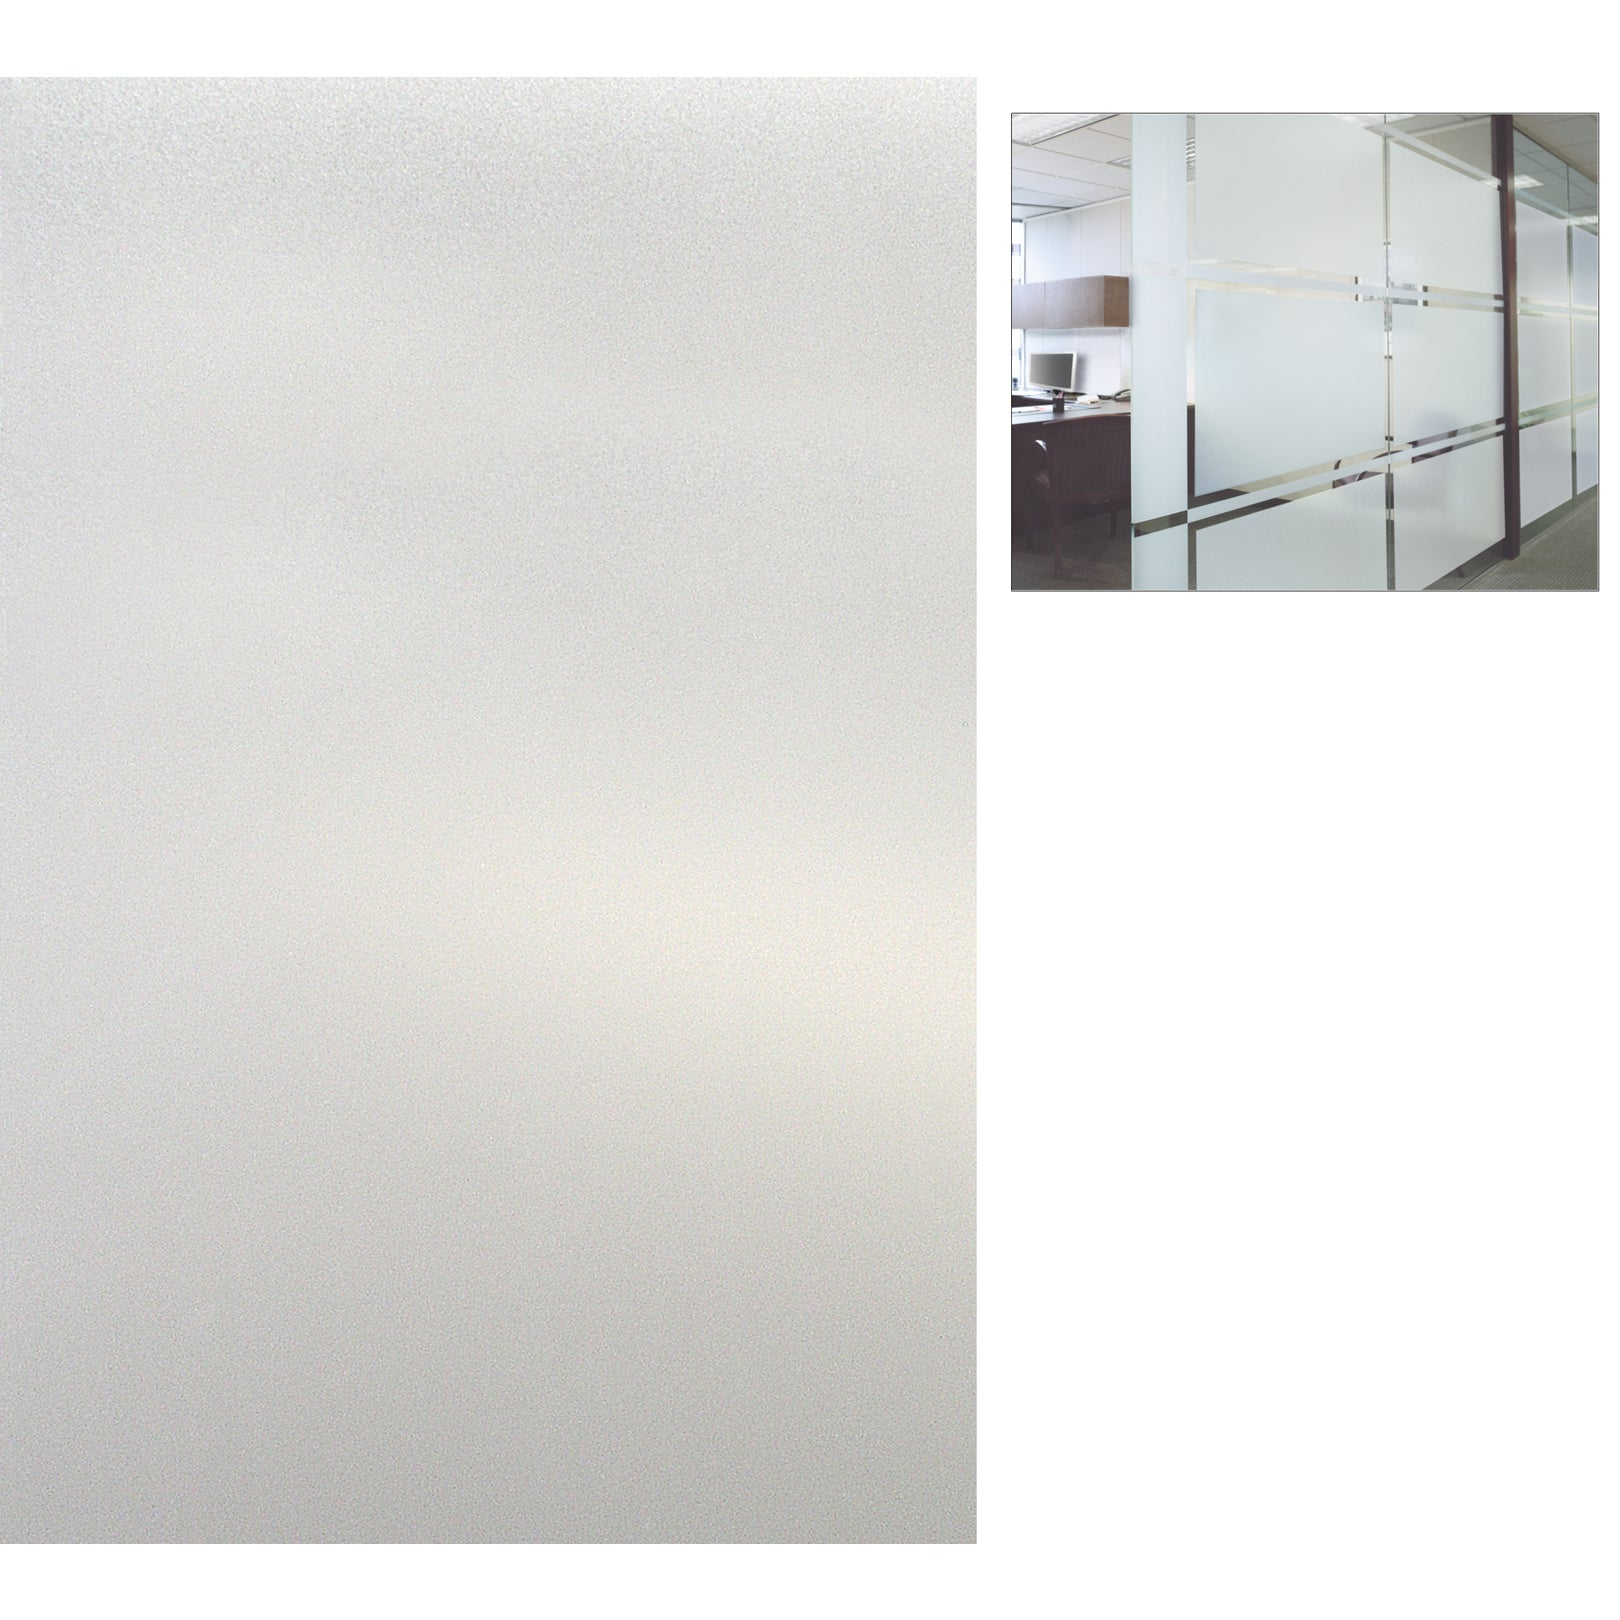 "Artscape 01-0124 12"" X 83"" Etched Glass Design Sidelights..."